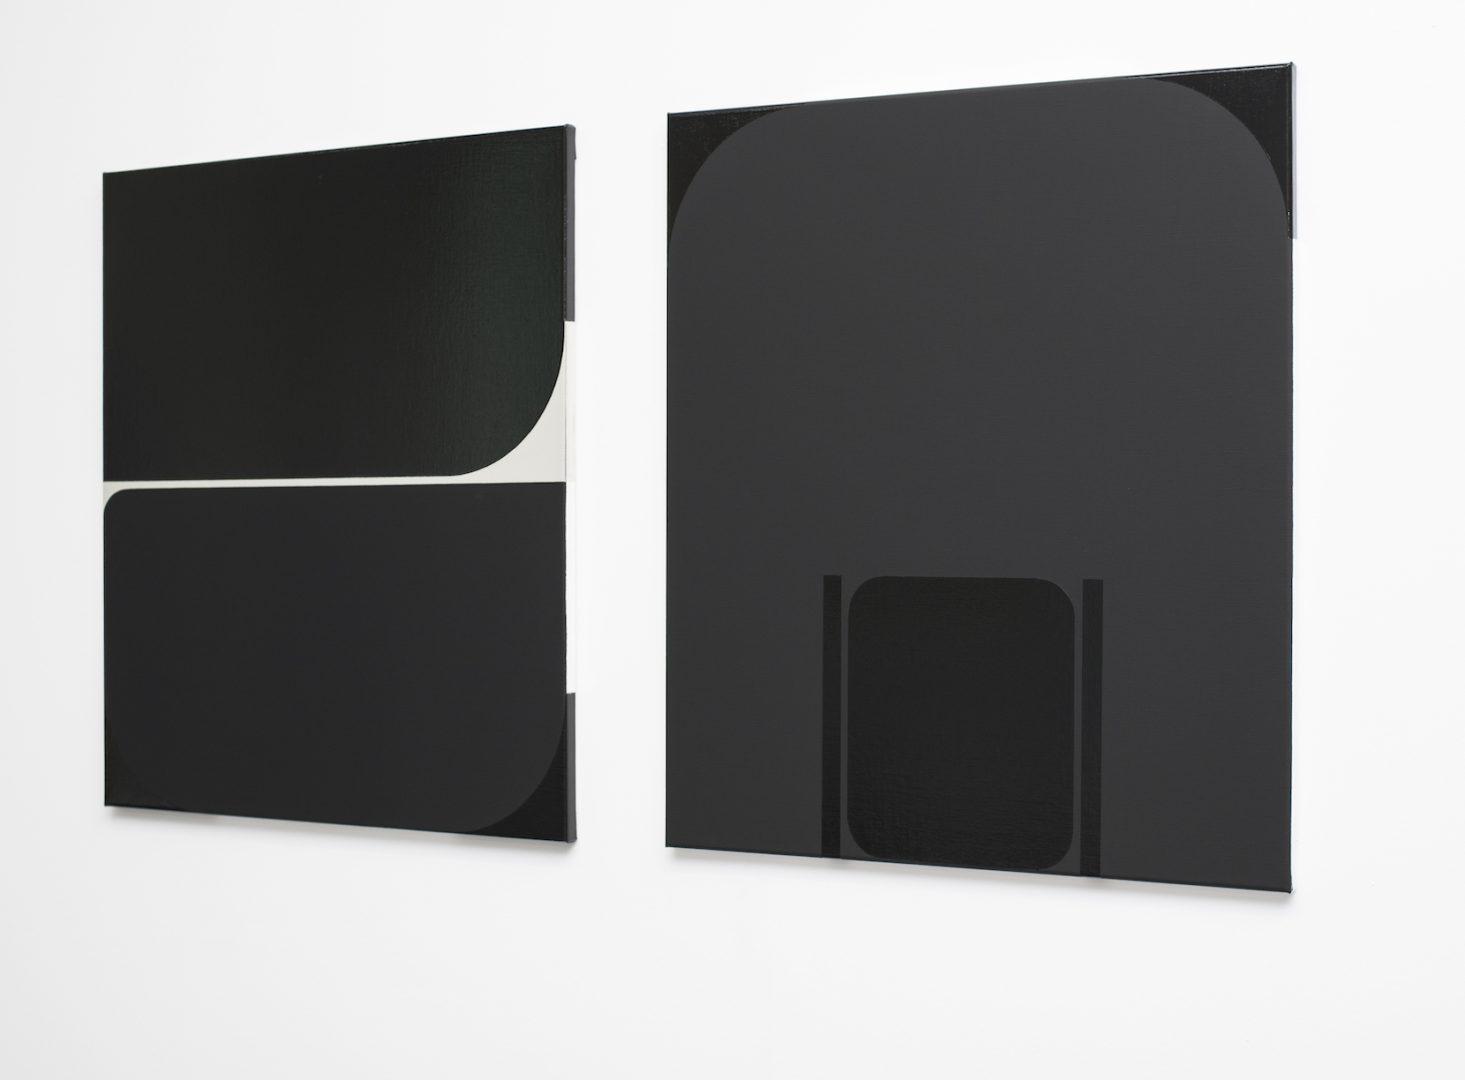 "Irina Ojovan, Sarmizegetusa N 50, 2018, oil and lacquer on canvas, 82x71 cm_Sarmizegetusa N 61"" 2019, oil and lacquer on canvas, 82x71 cm"